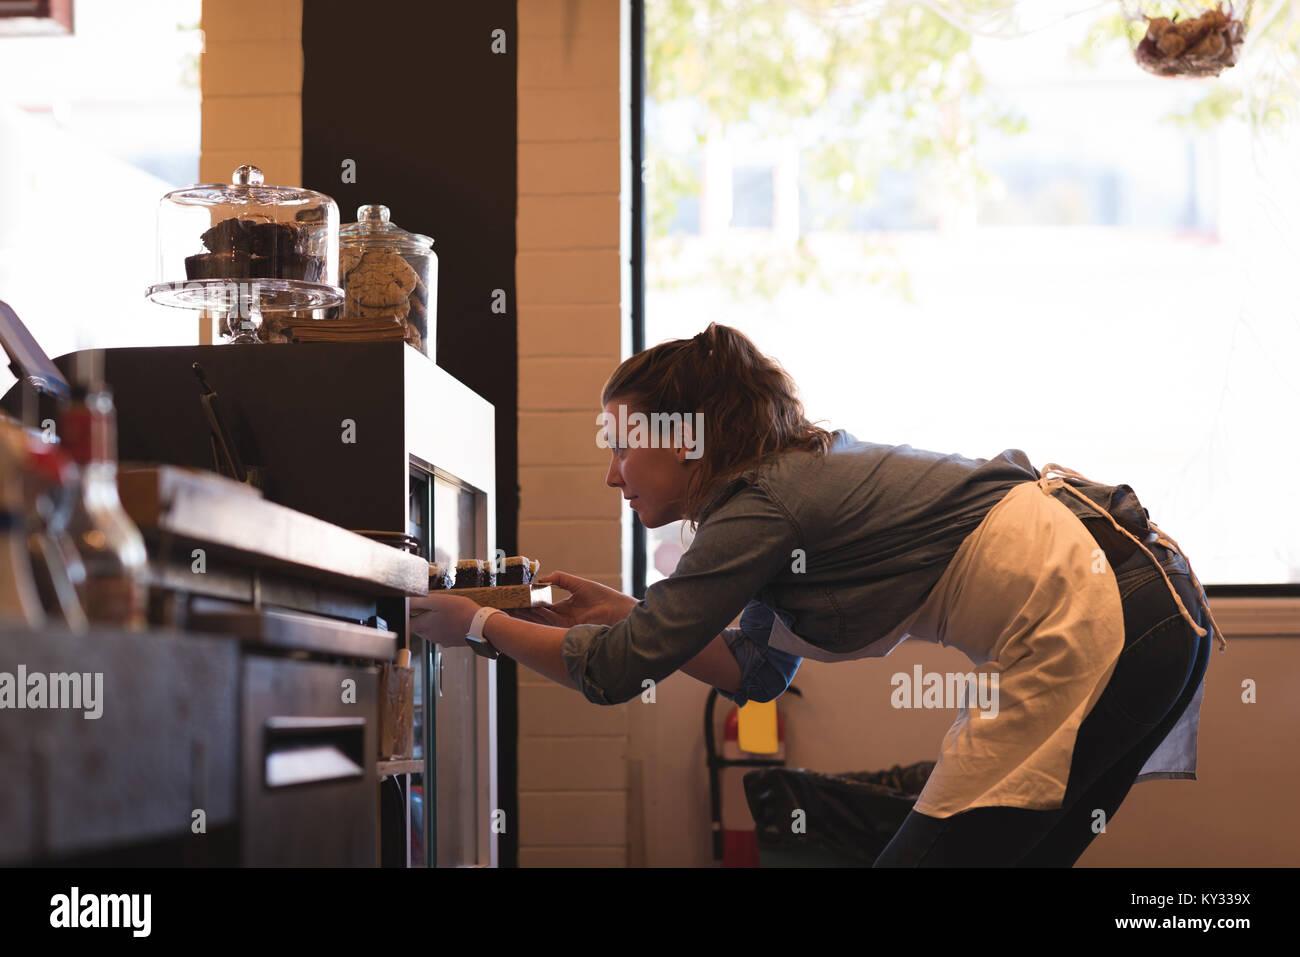 Waitress Stock Photos & Waitress Stock Images - Alamy